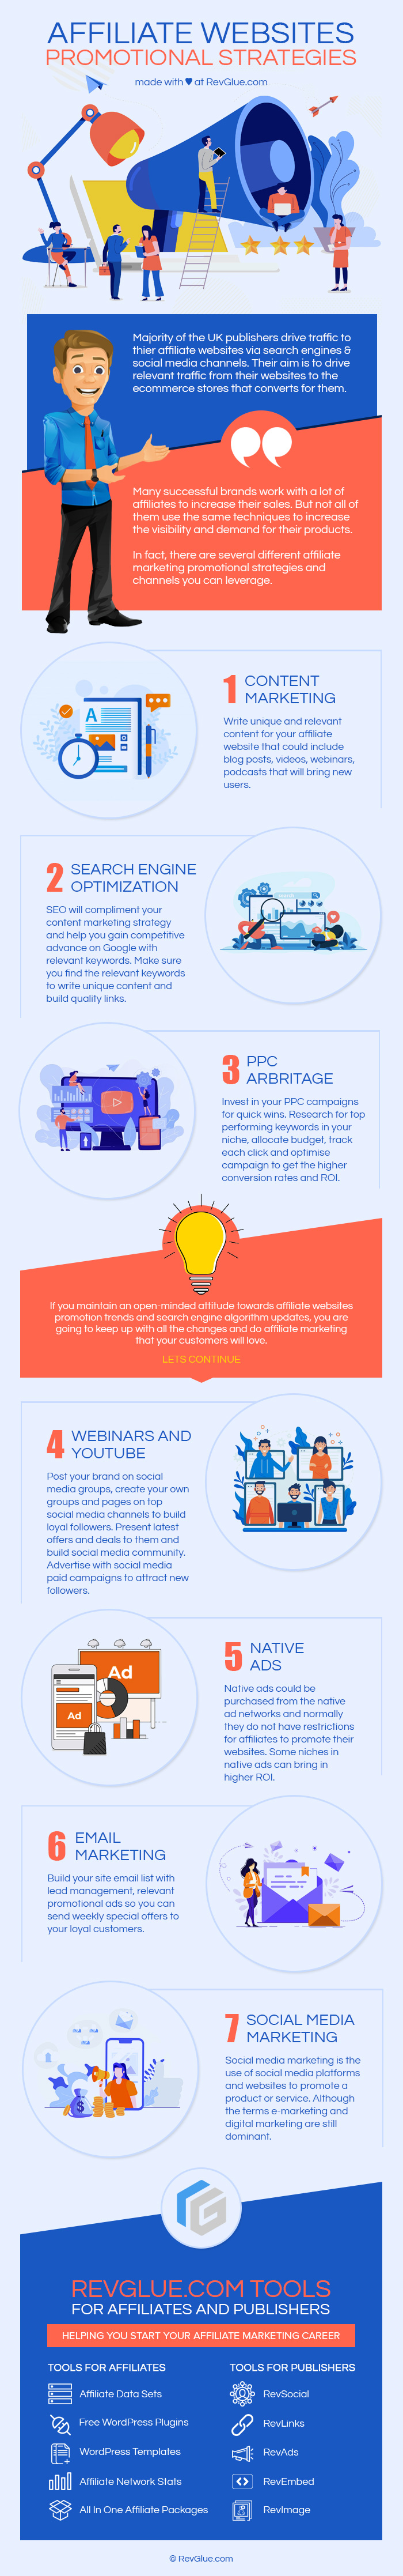 Affiliate Websites Promotional Stragegies Infographic